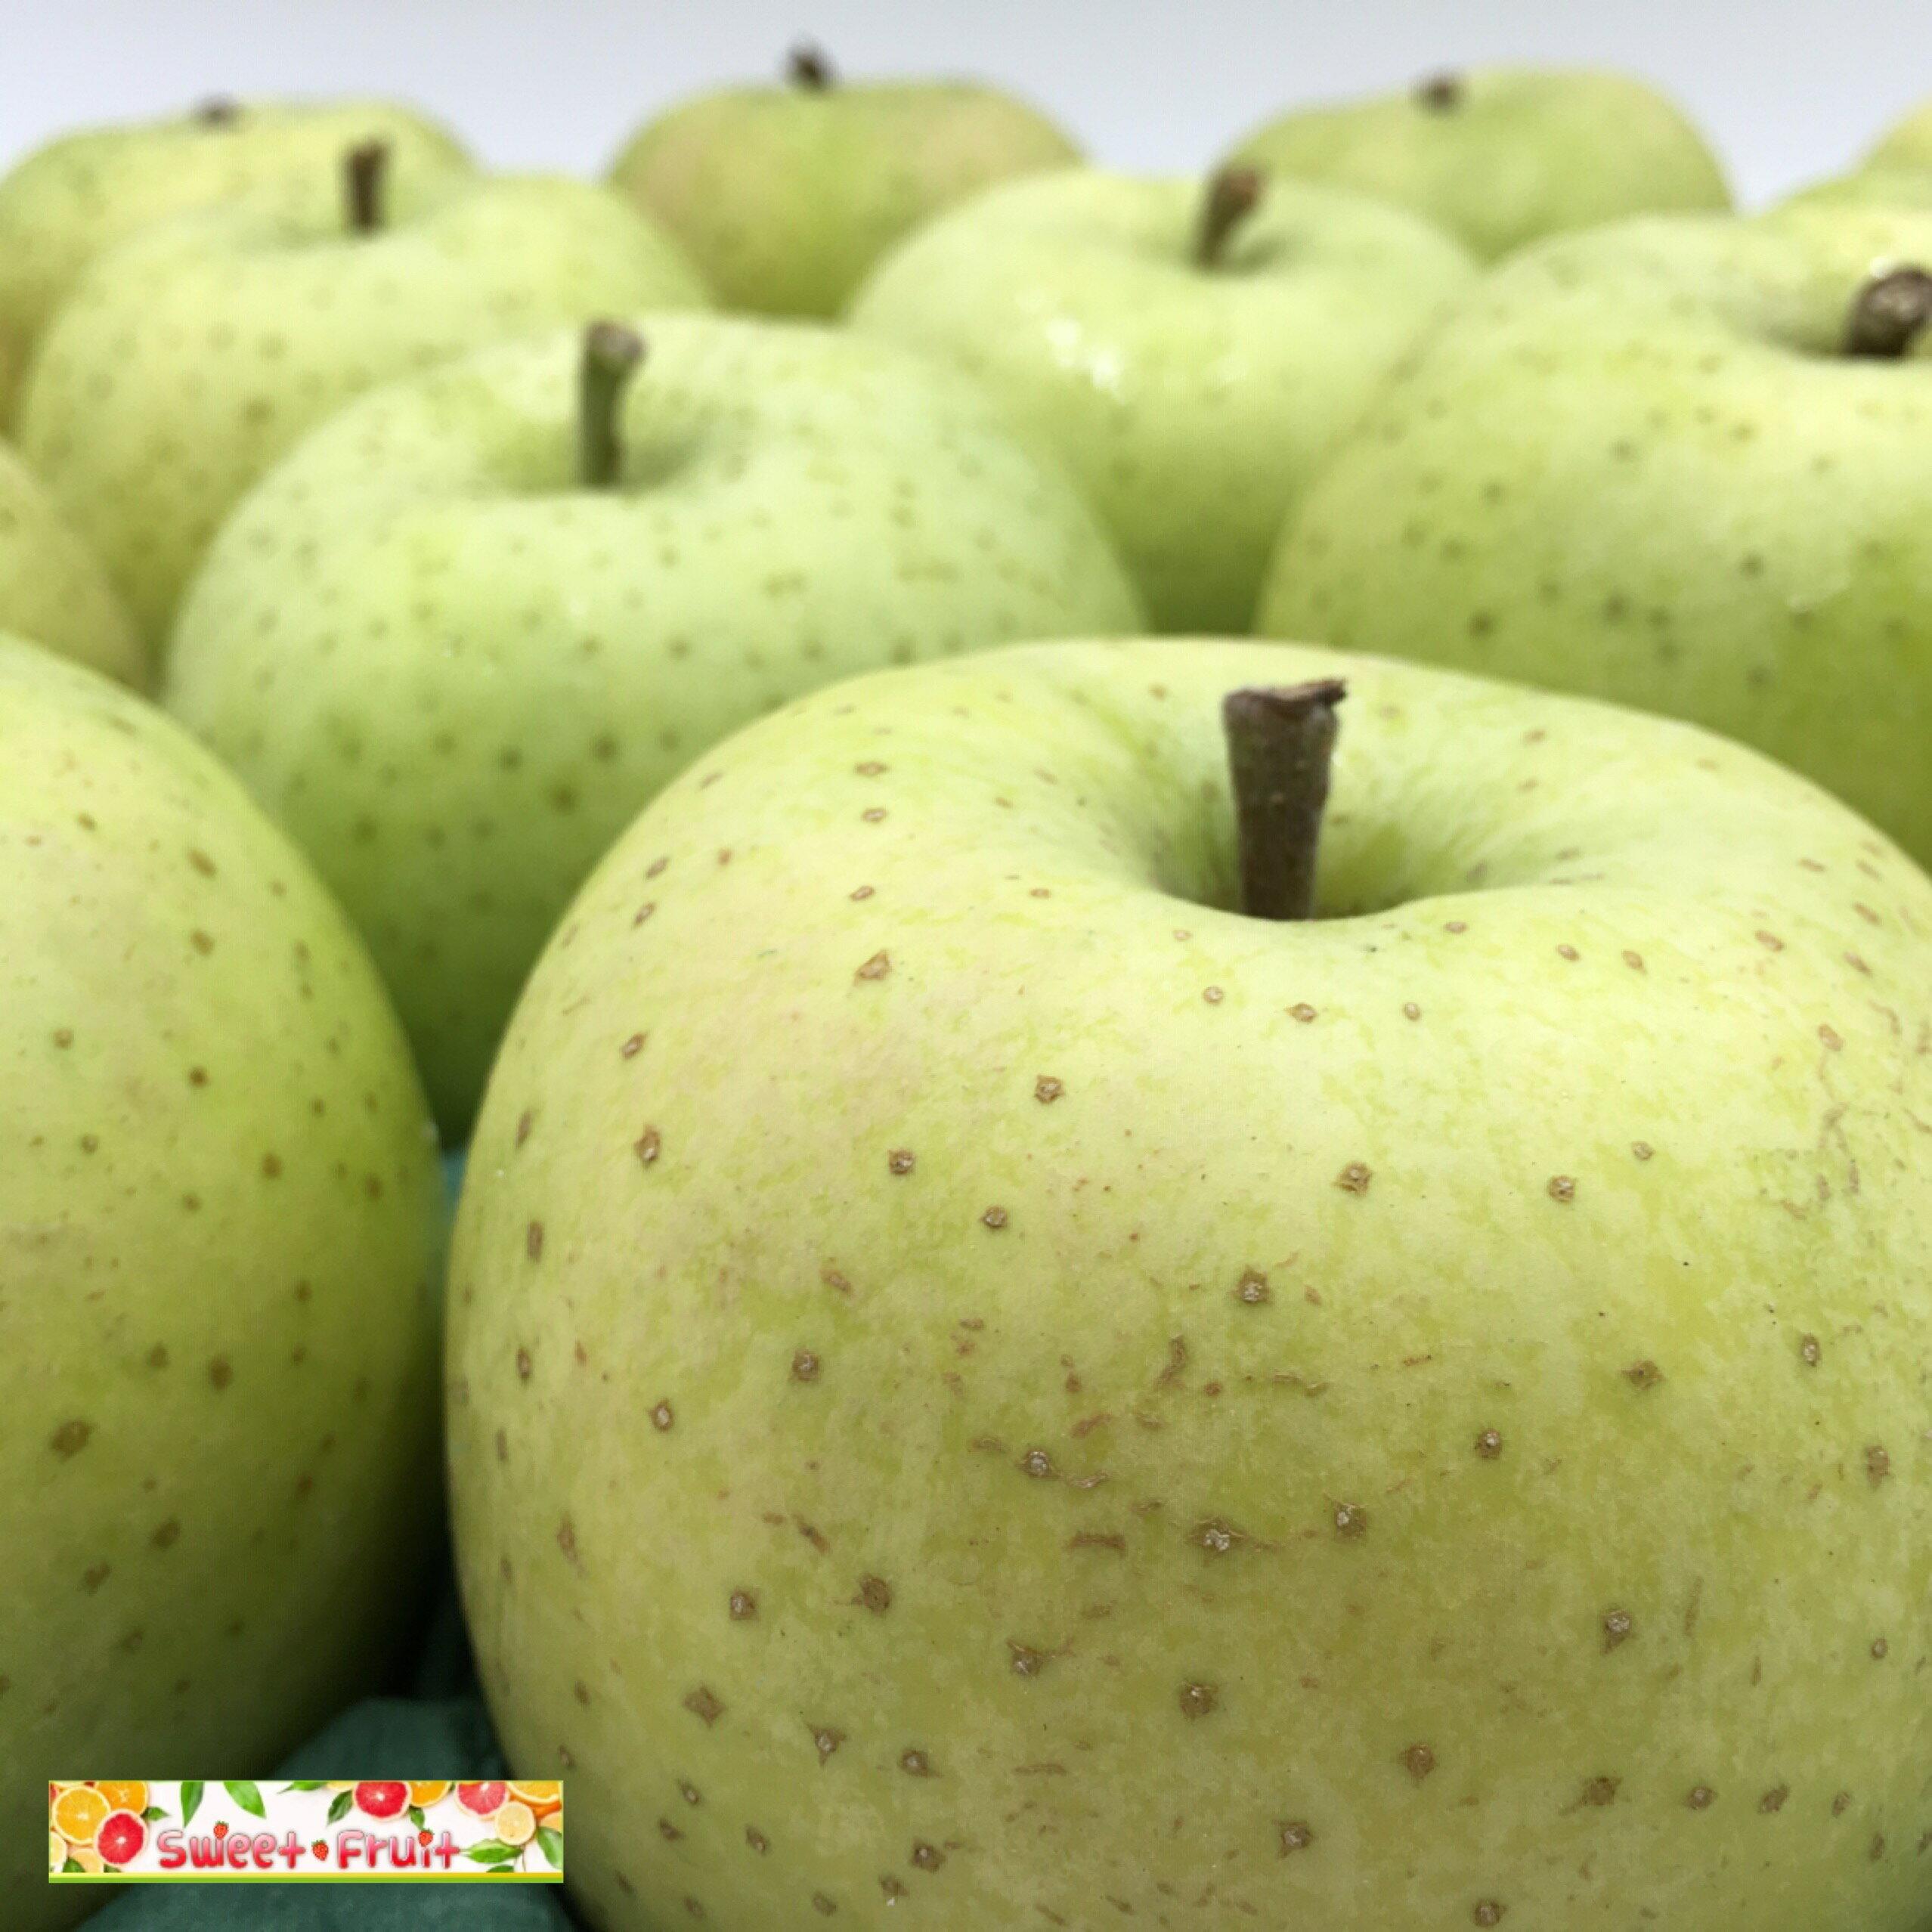 {SWEET FRUIT} 日本青森王林青蘋果 頂級特選 16顆禮盒裝(32顆分裝)堅持最高品質